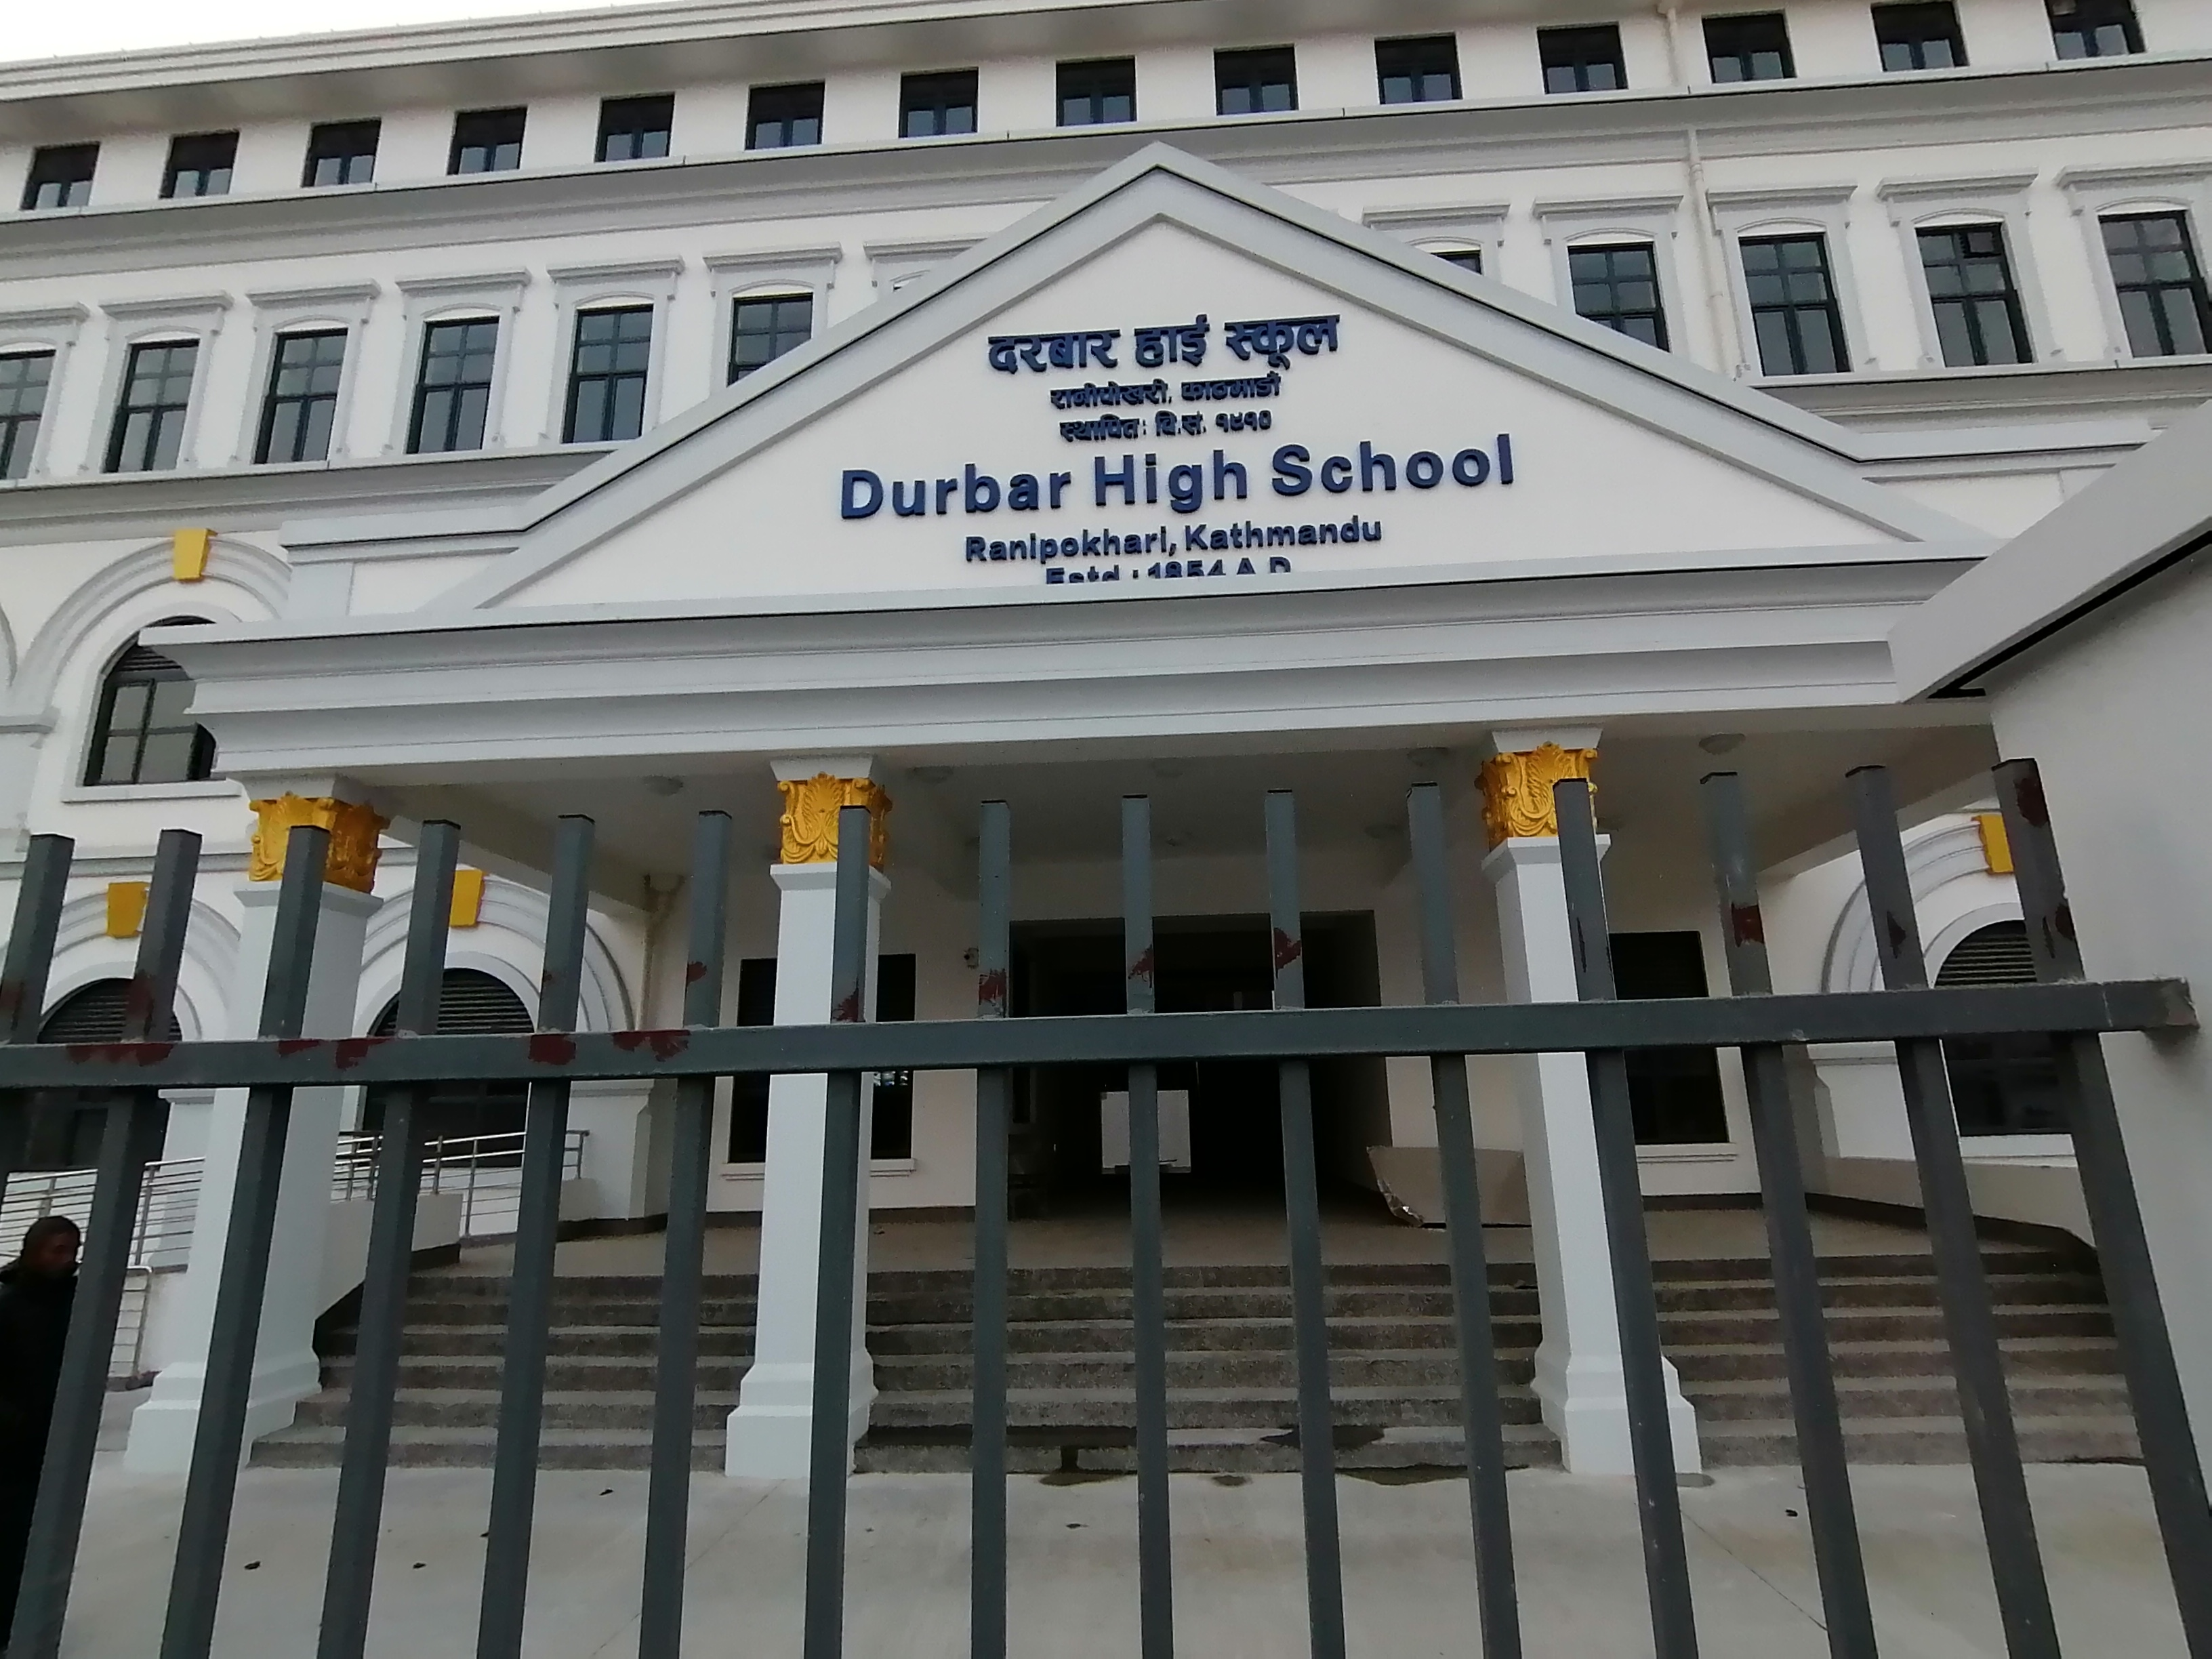 Durbar High School - Wikipedia